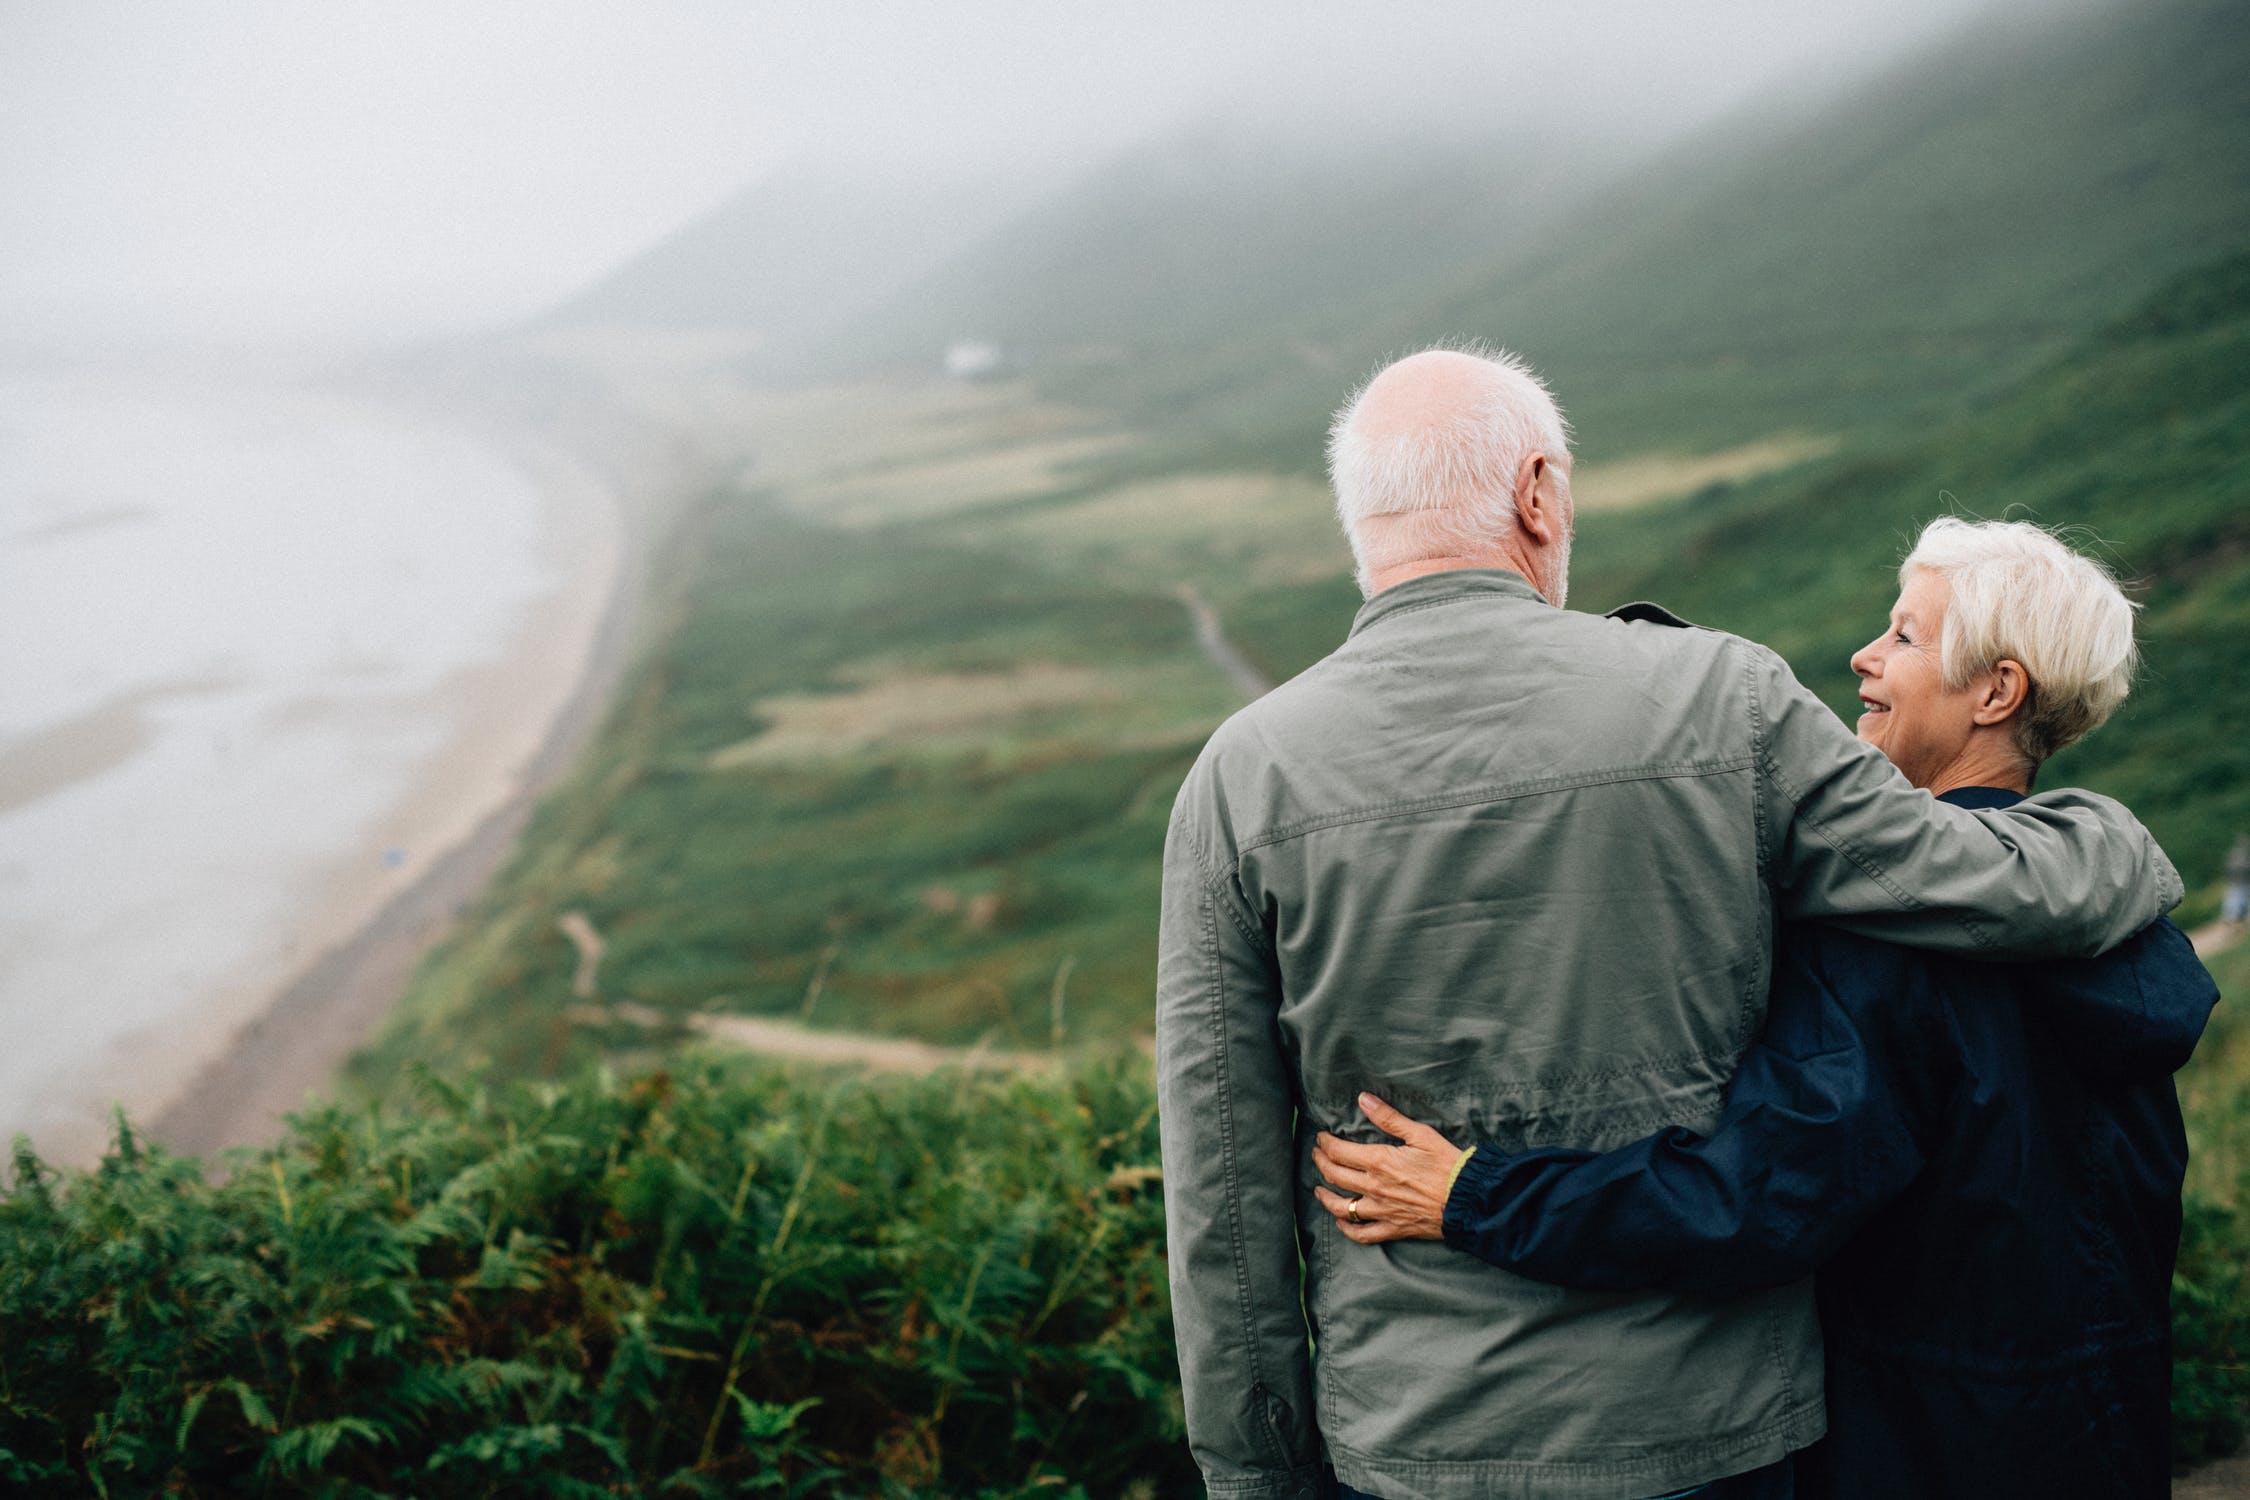 Pareja de ancianos observando la naturaleza. | Imagen: Pexels